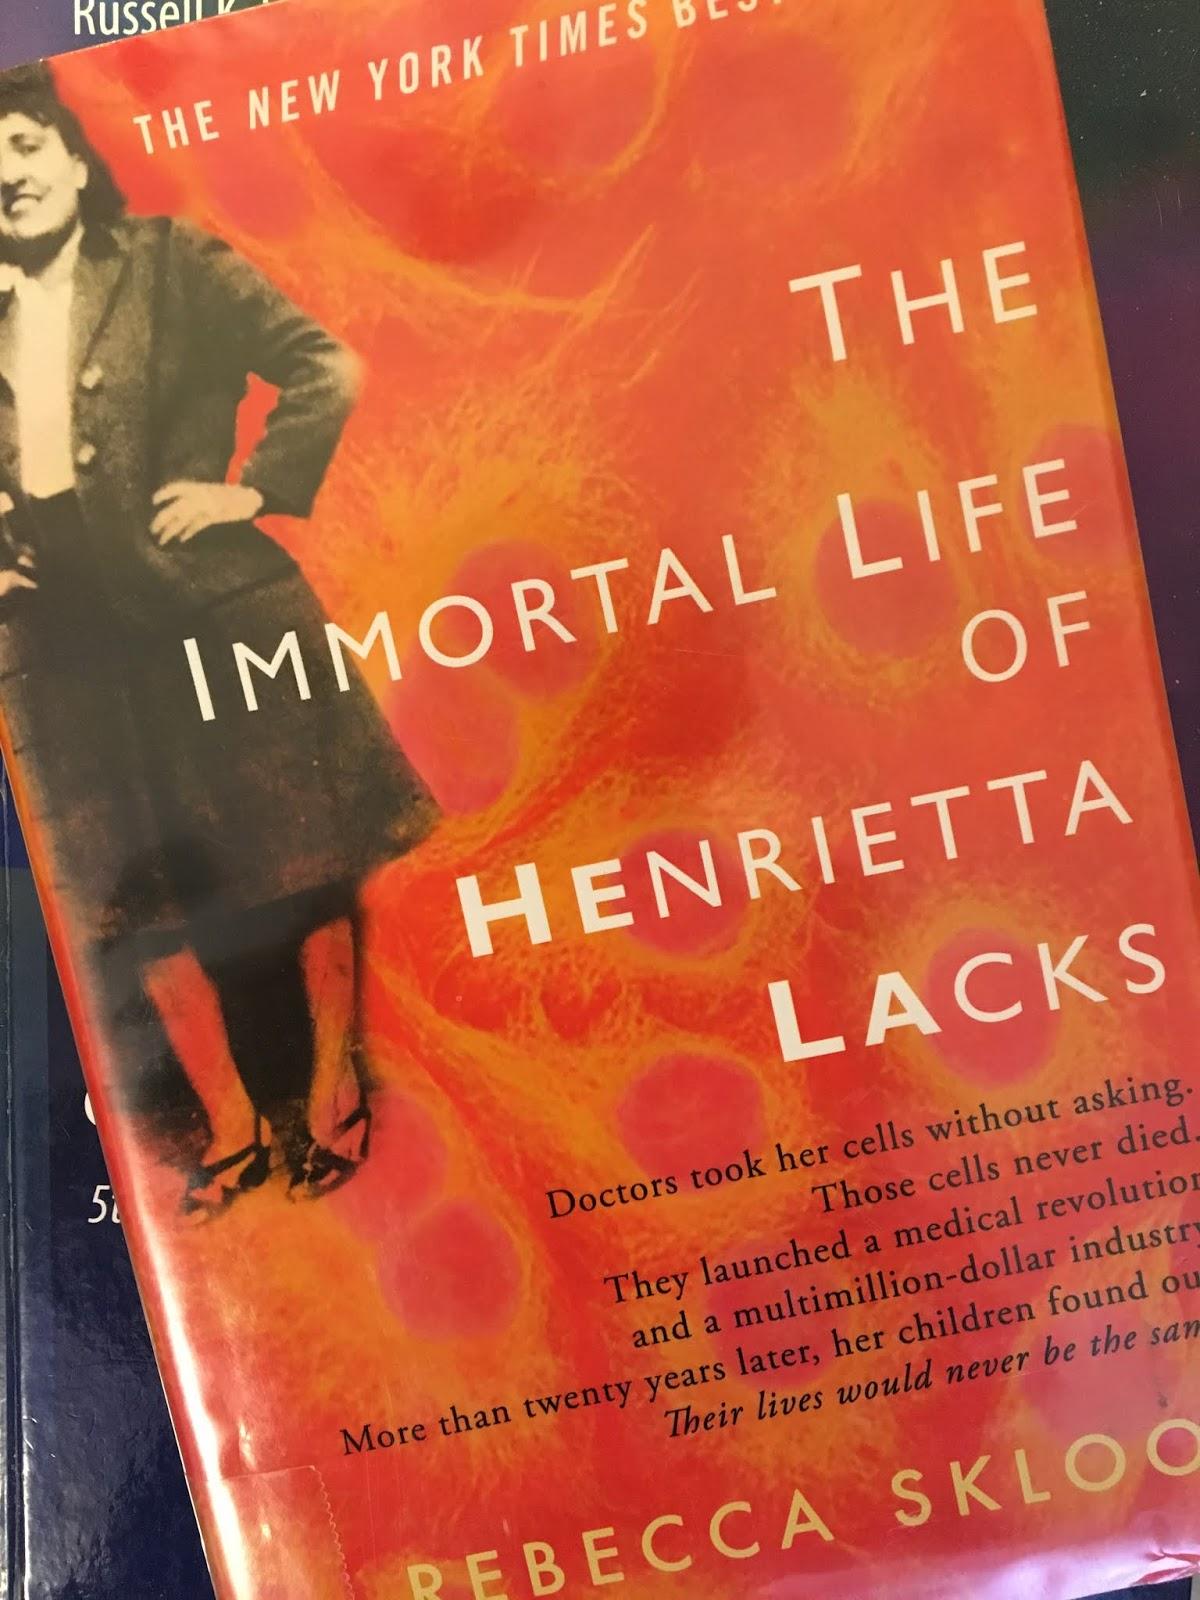 The Immortal Life of Henrietta Lacks, Author Rebecca